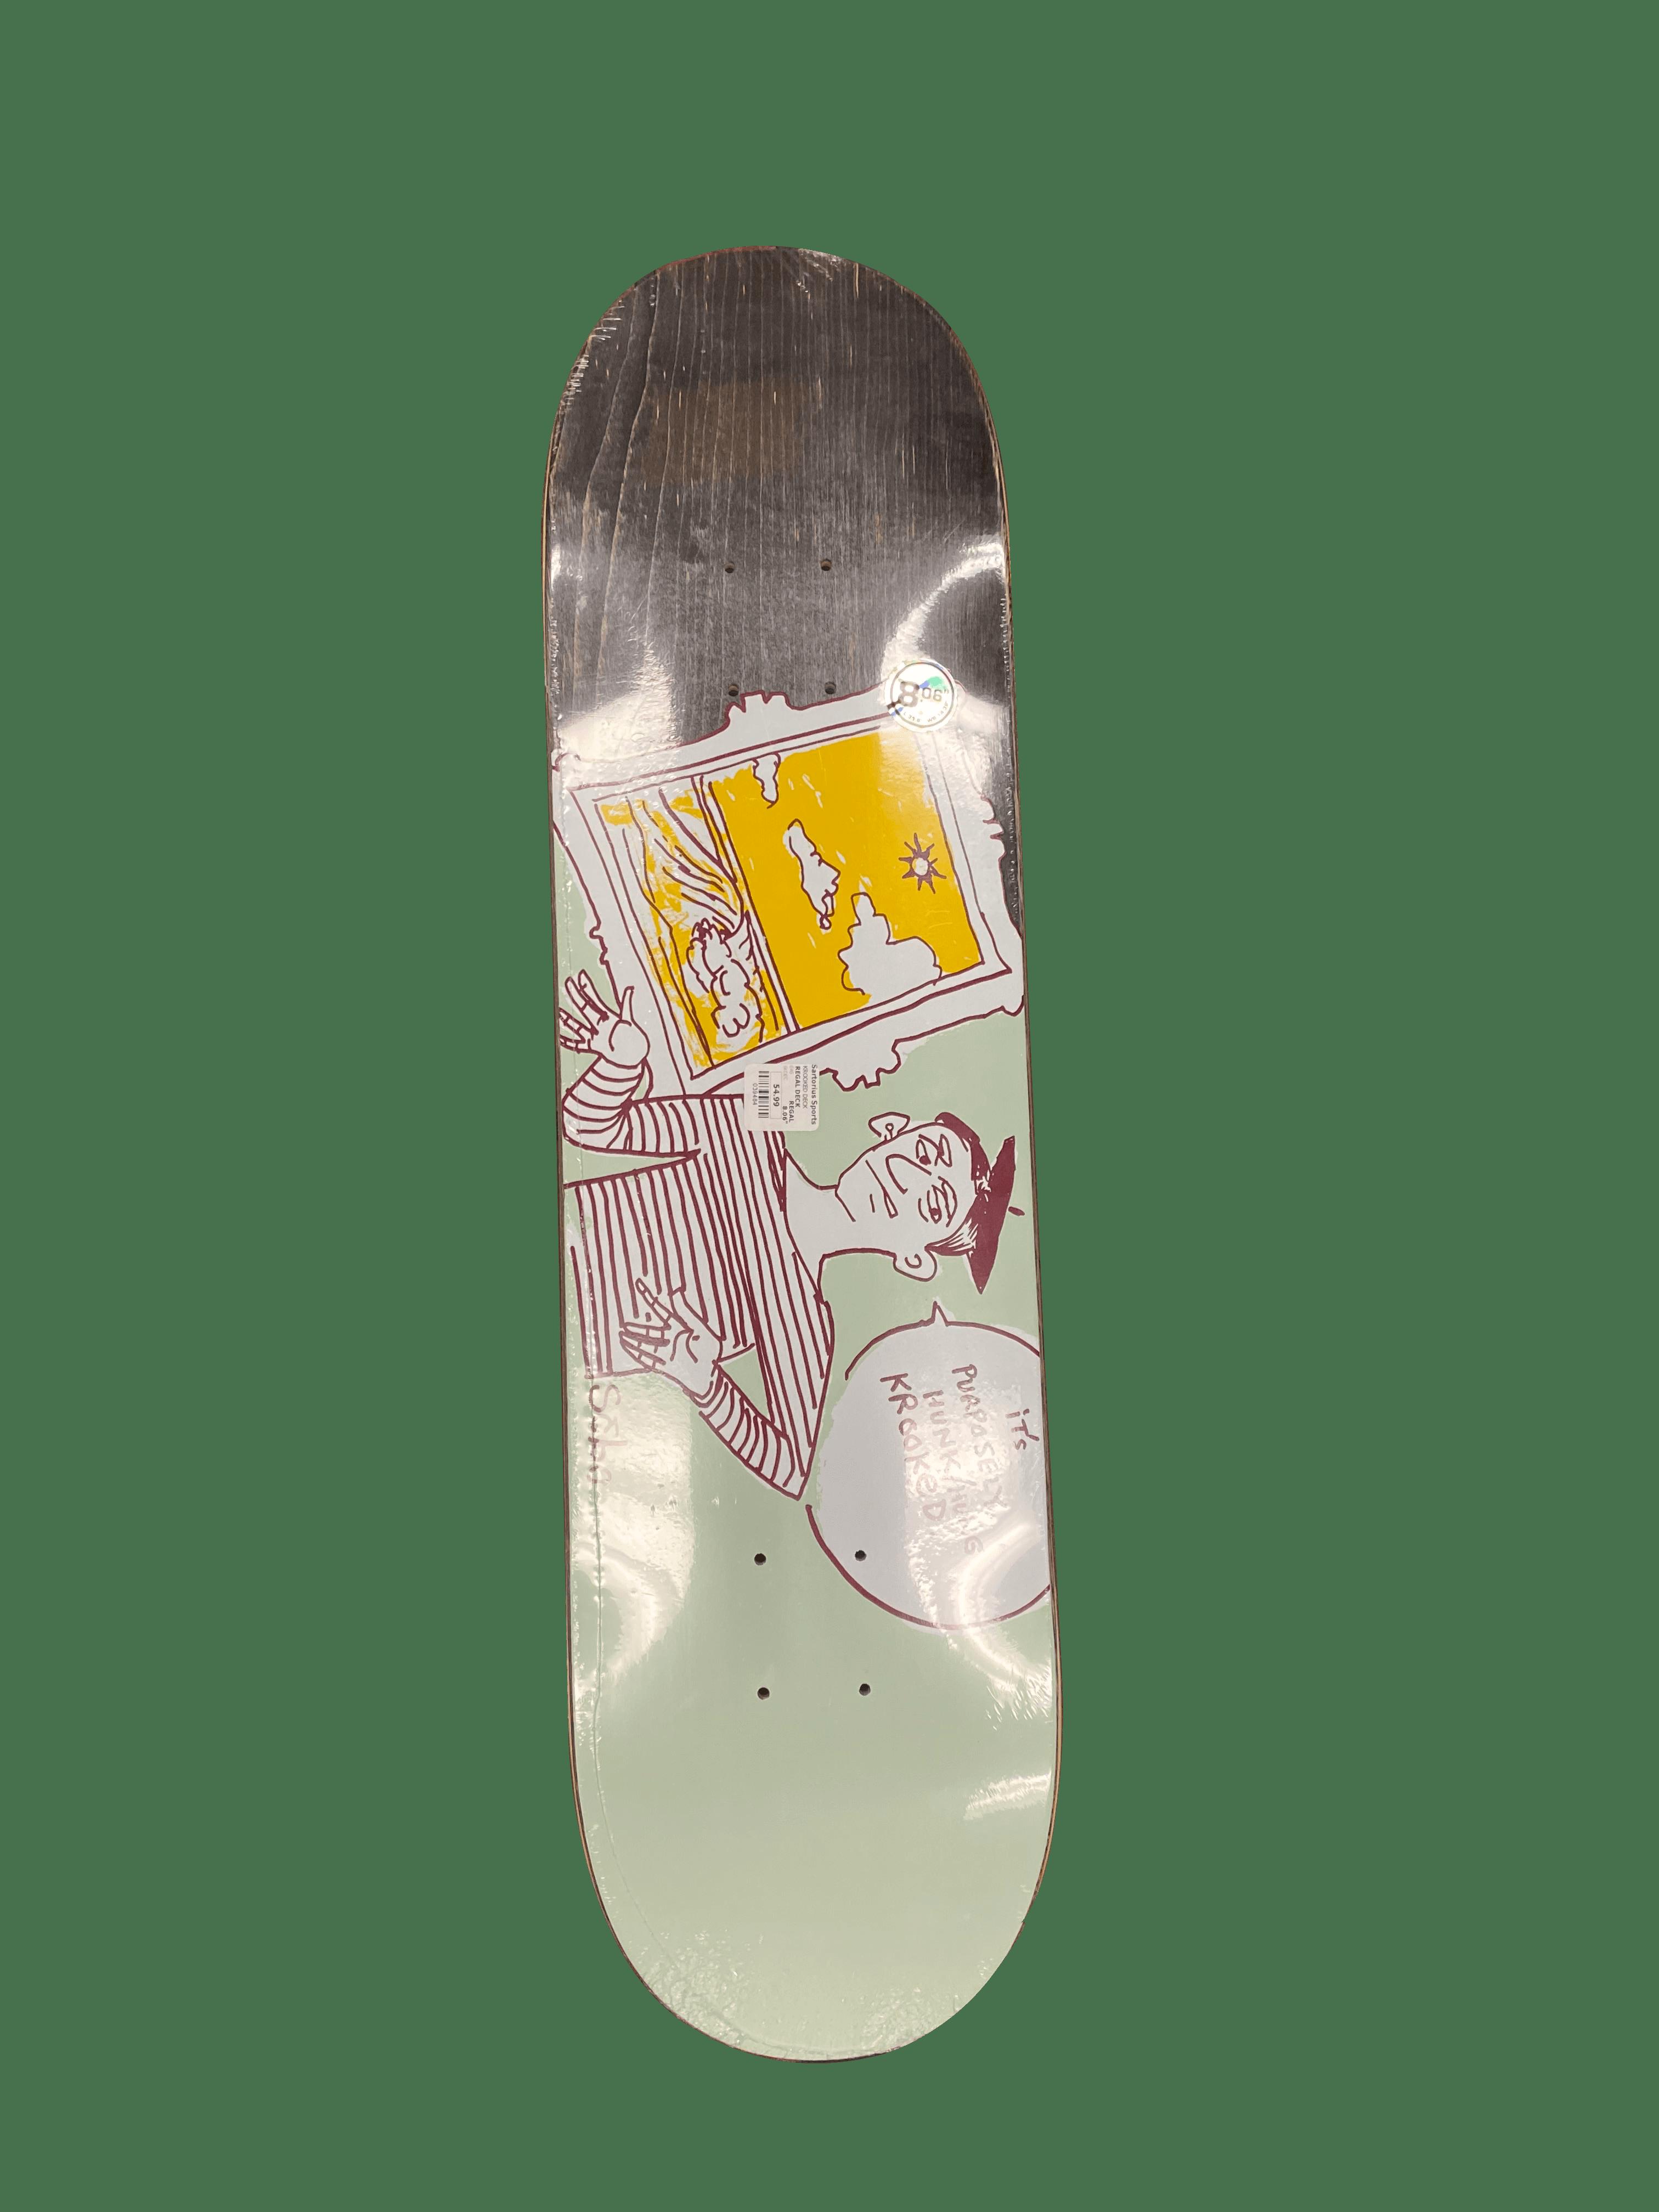 Krooked-Krooked,-39484,$-54